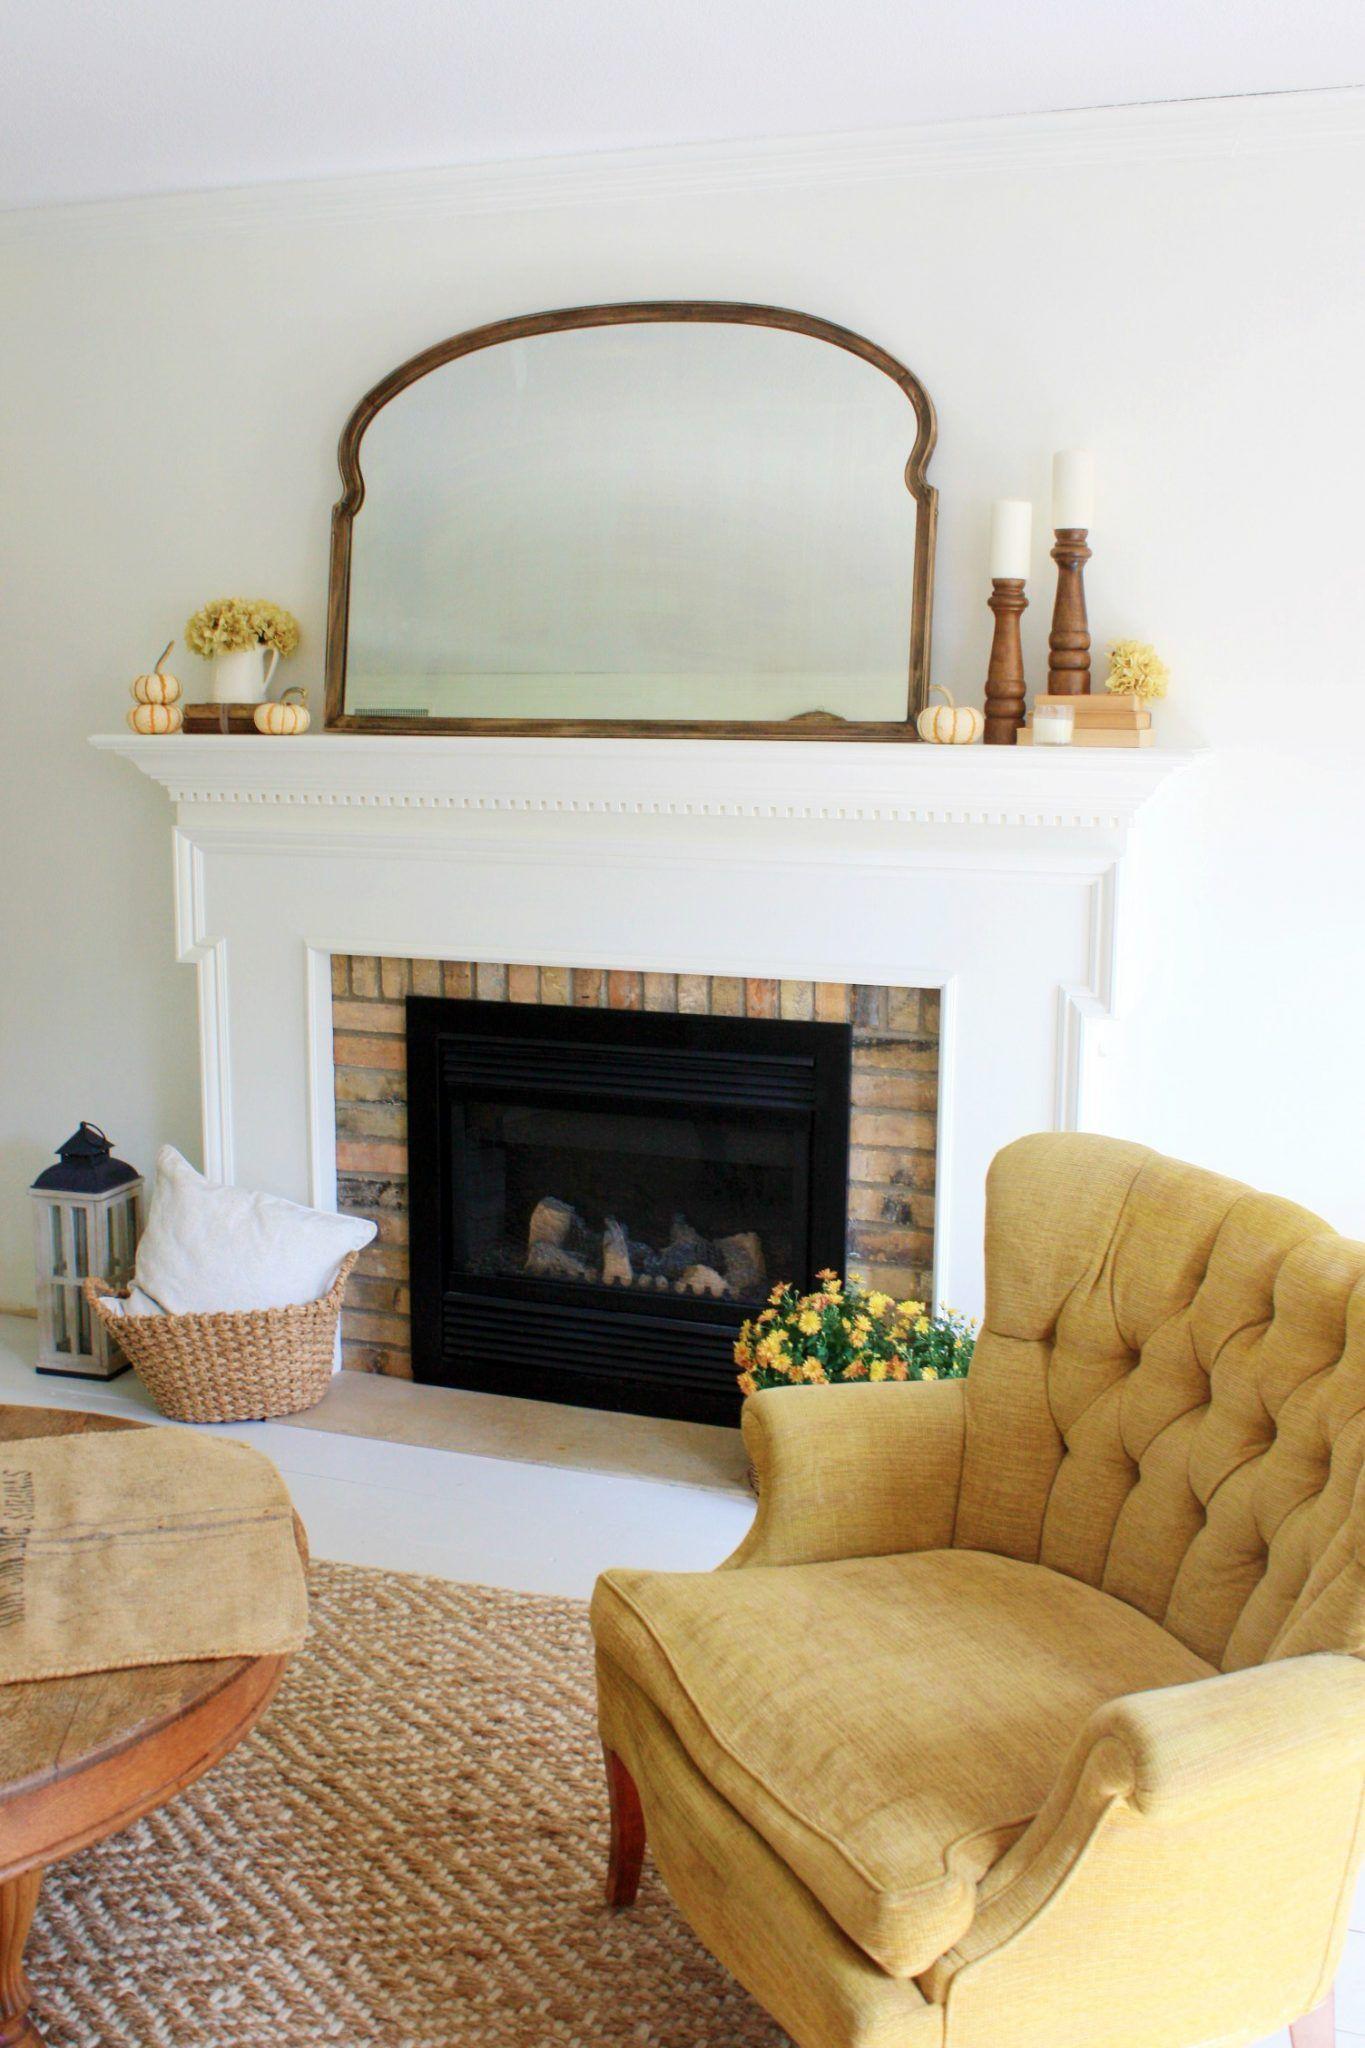 Simple Rustic Fall Living Room Decor | Fall living room ...